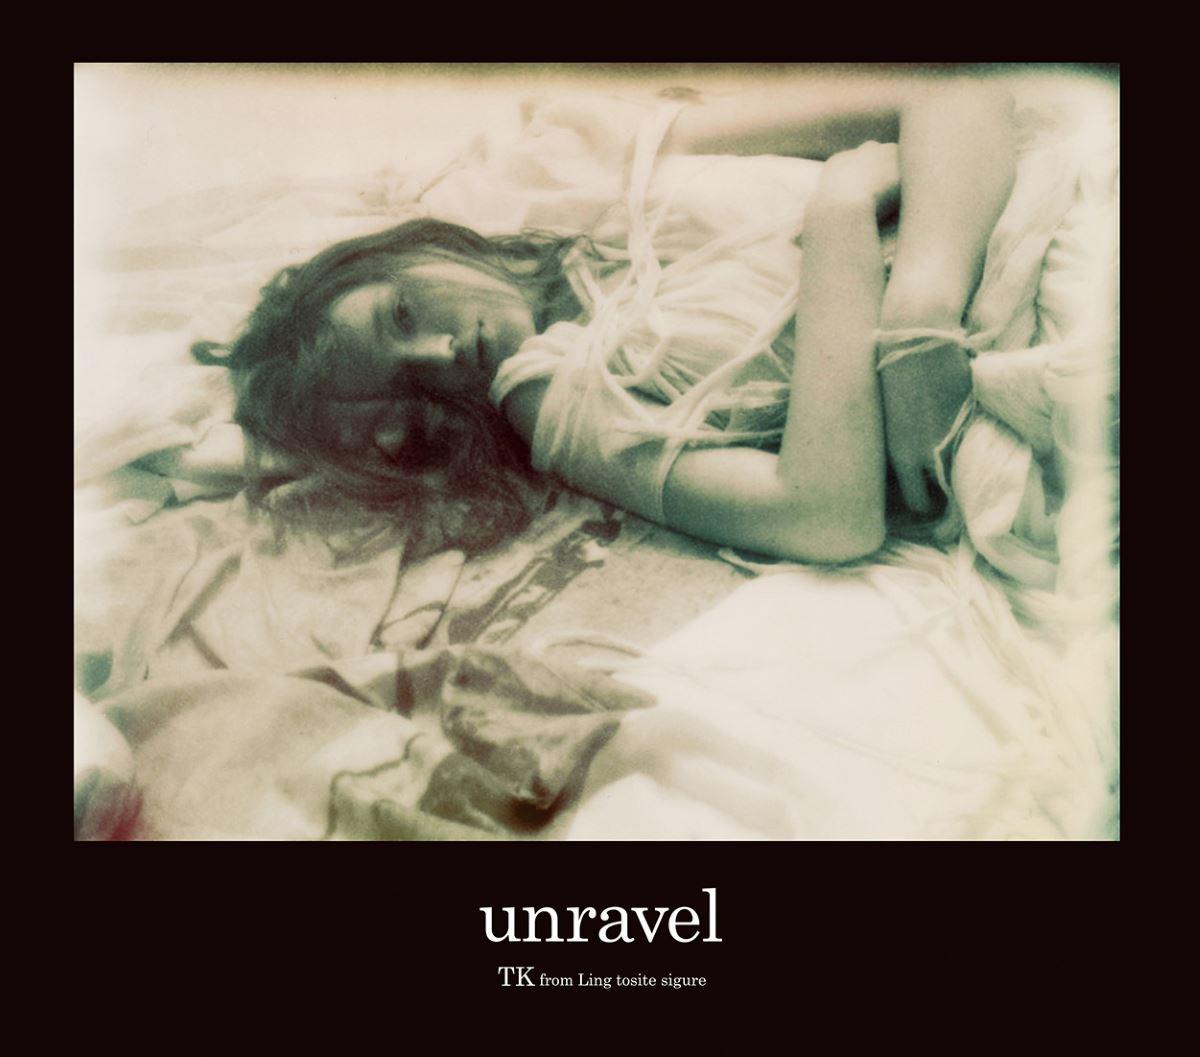 『TK from 凛として時雨 - unravel』収録の『unravel』ジャケット